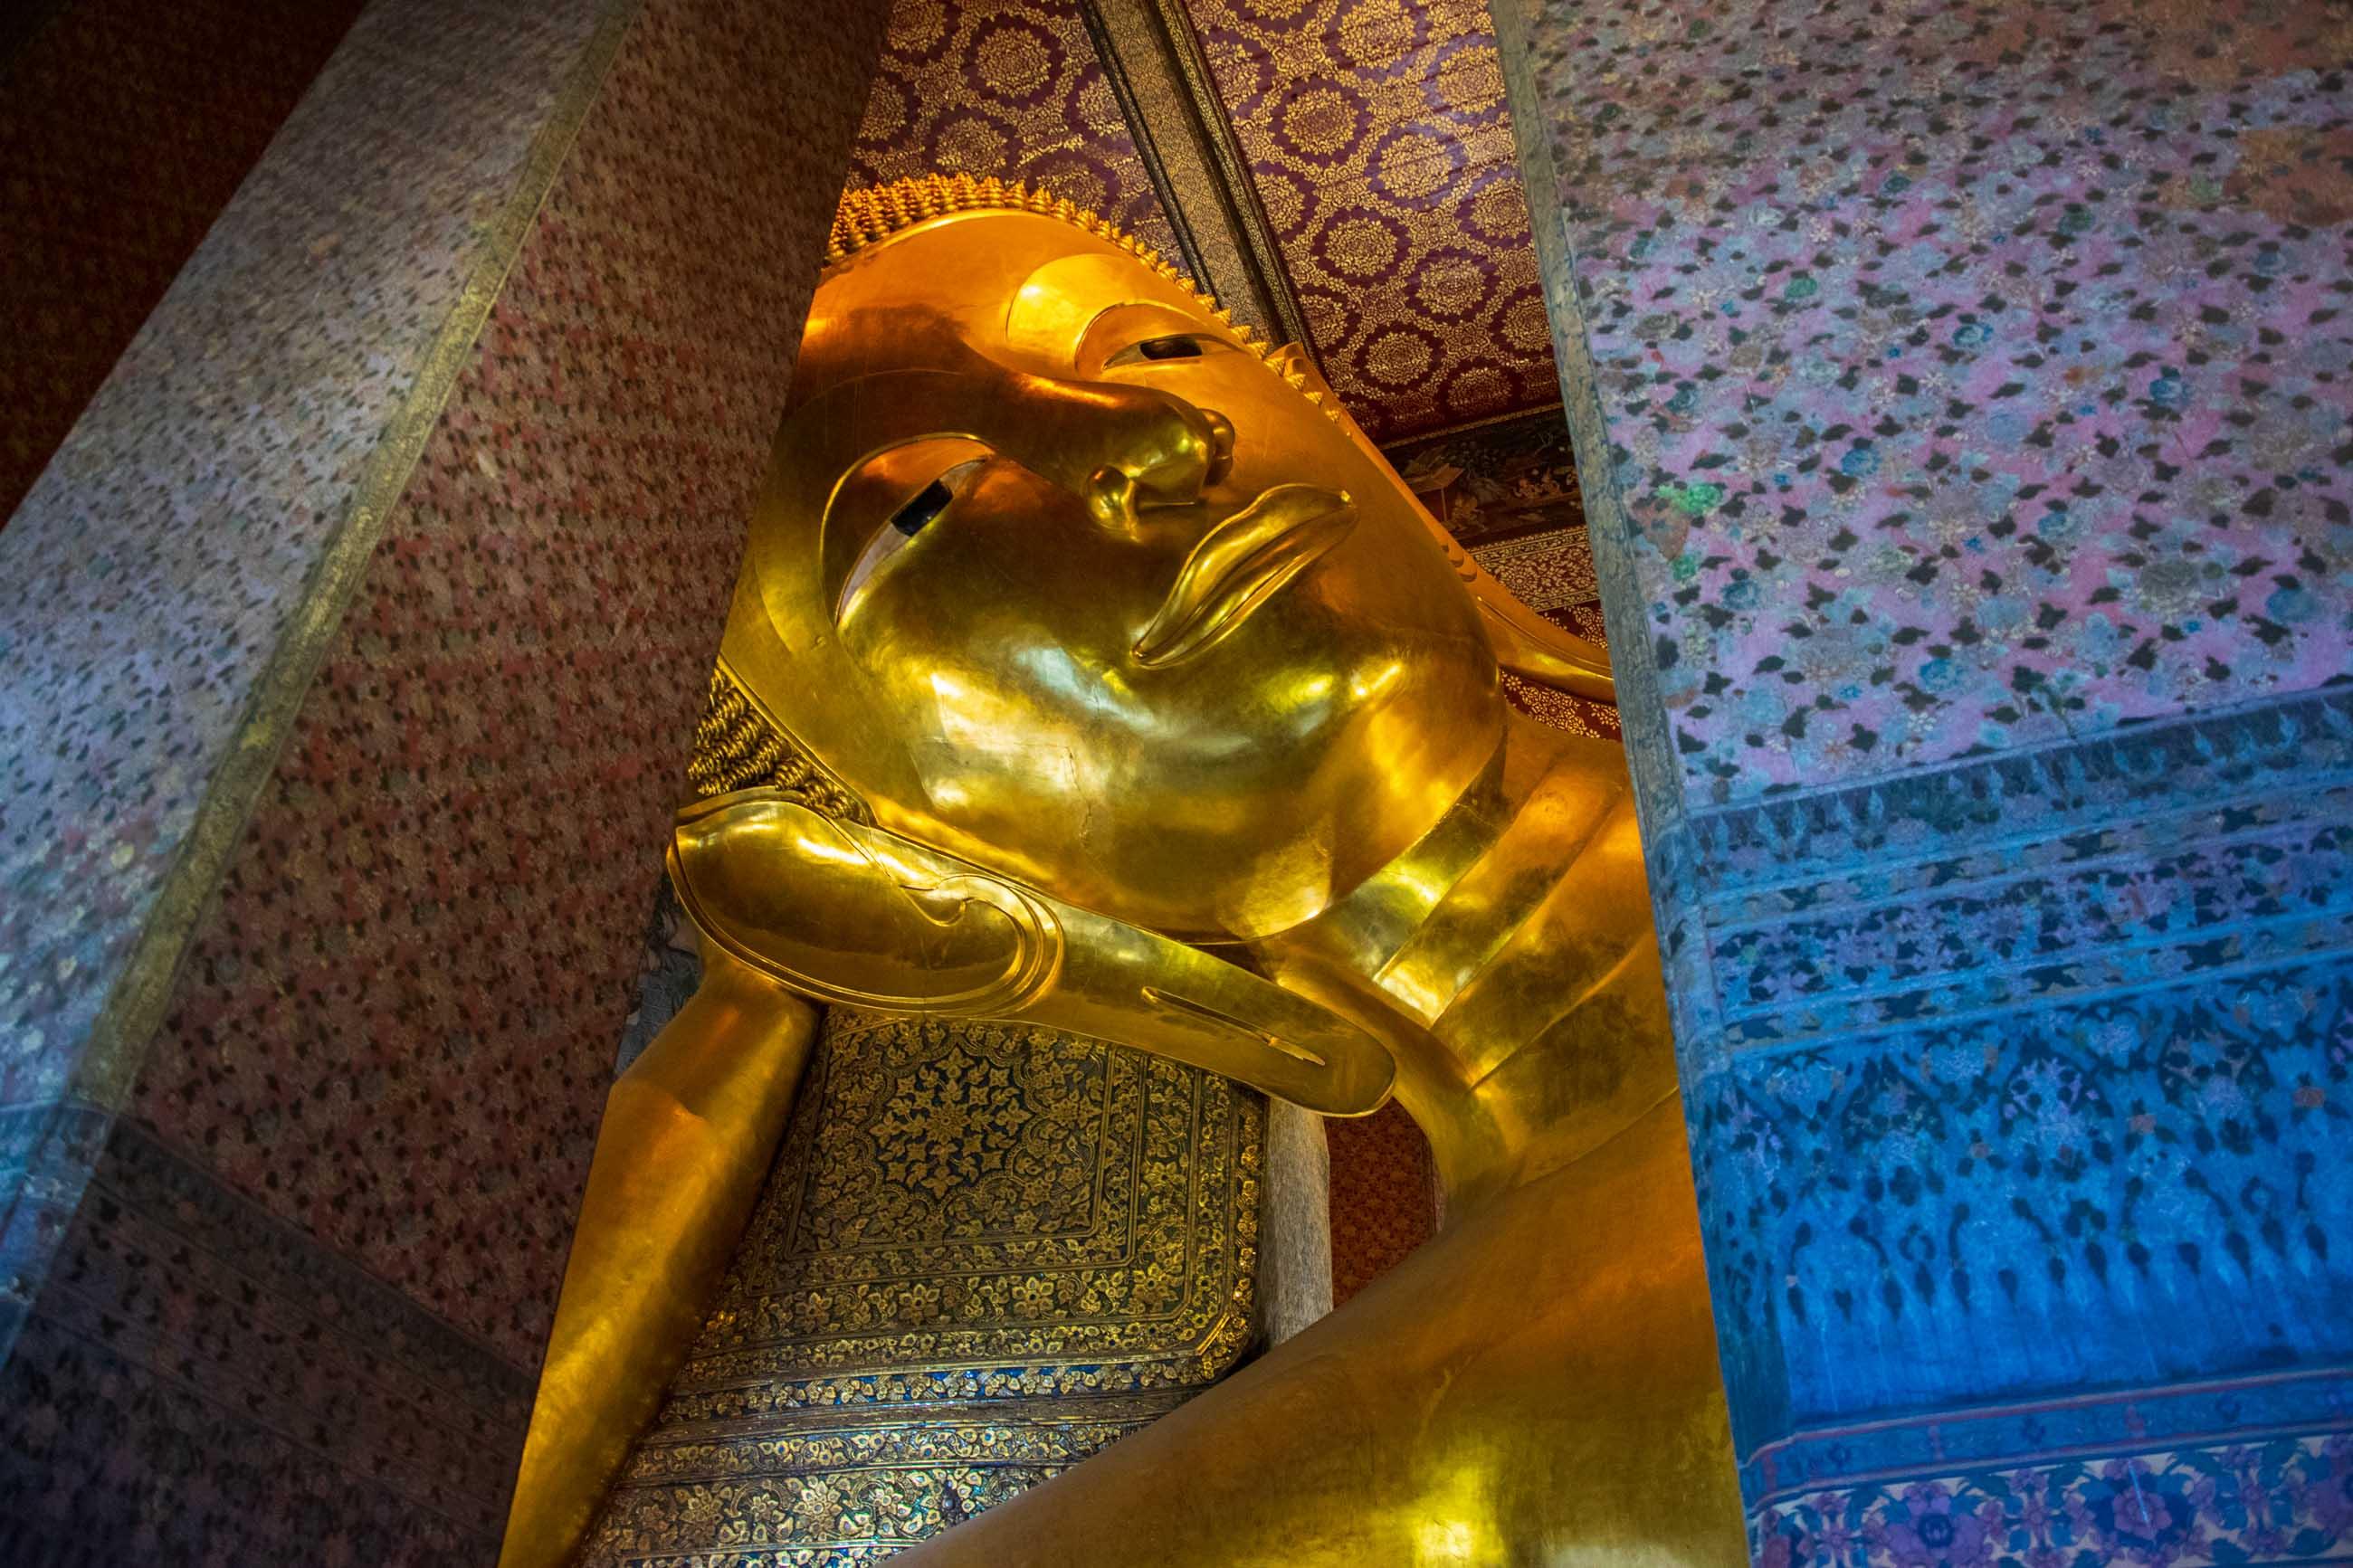 https://bubo.sk/uploads/galleries/5061/adam_zahorsky_thajsko_bangkok_dsc_0094.jpg